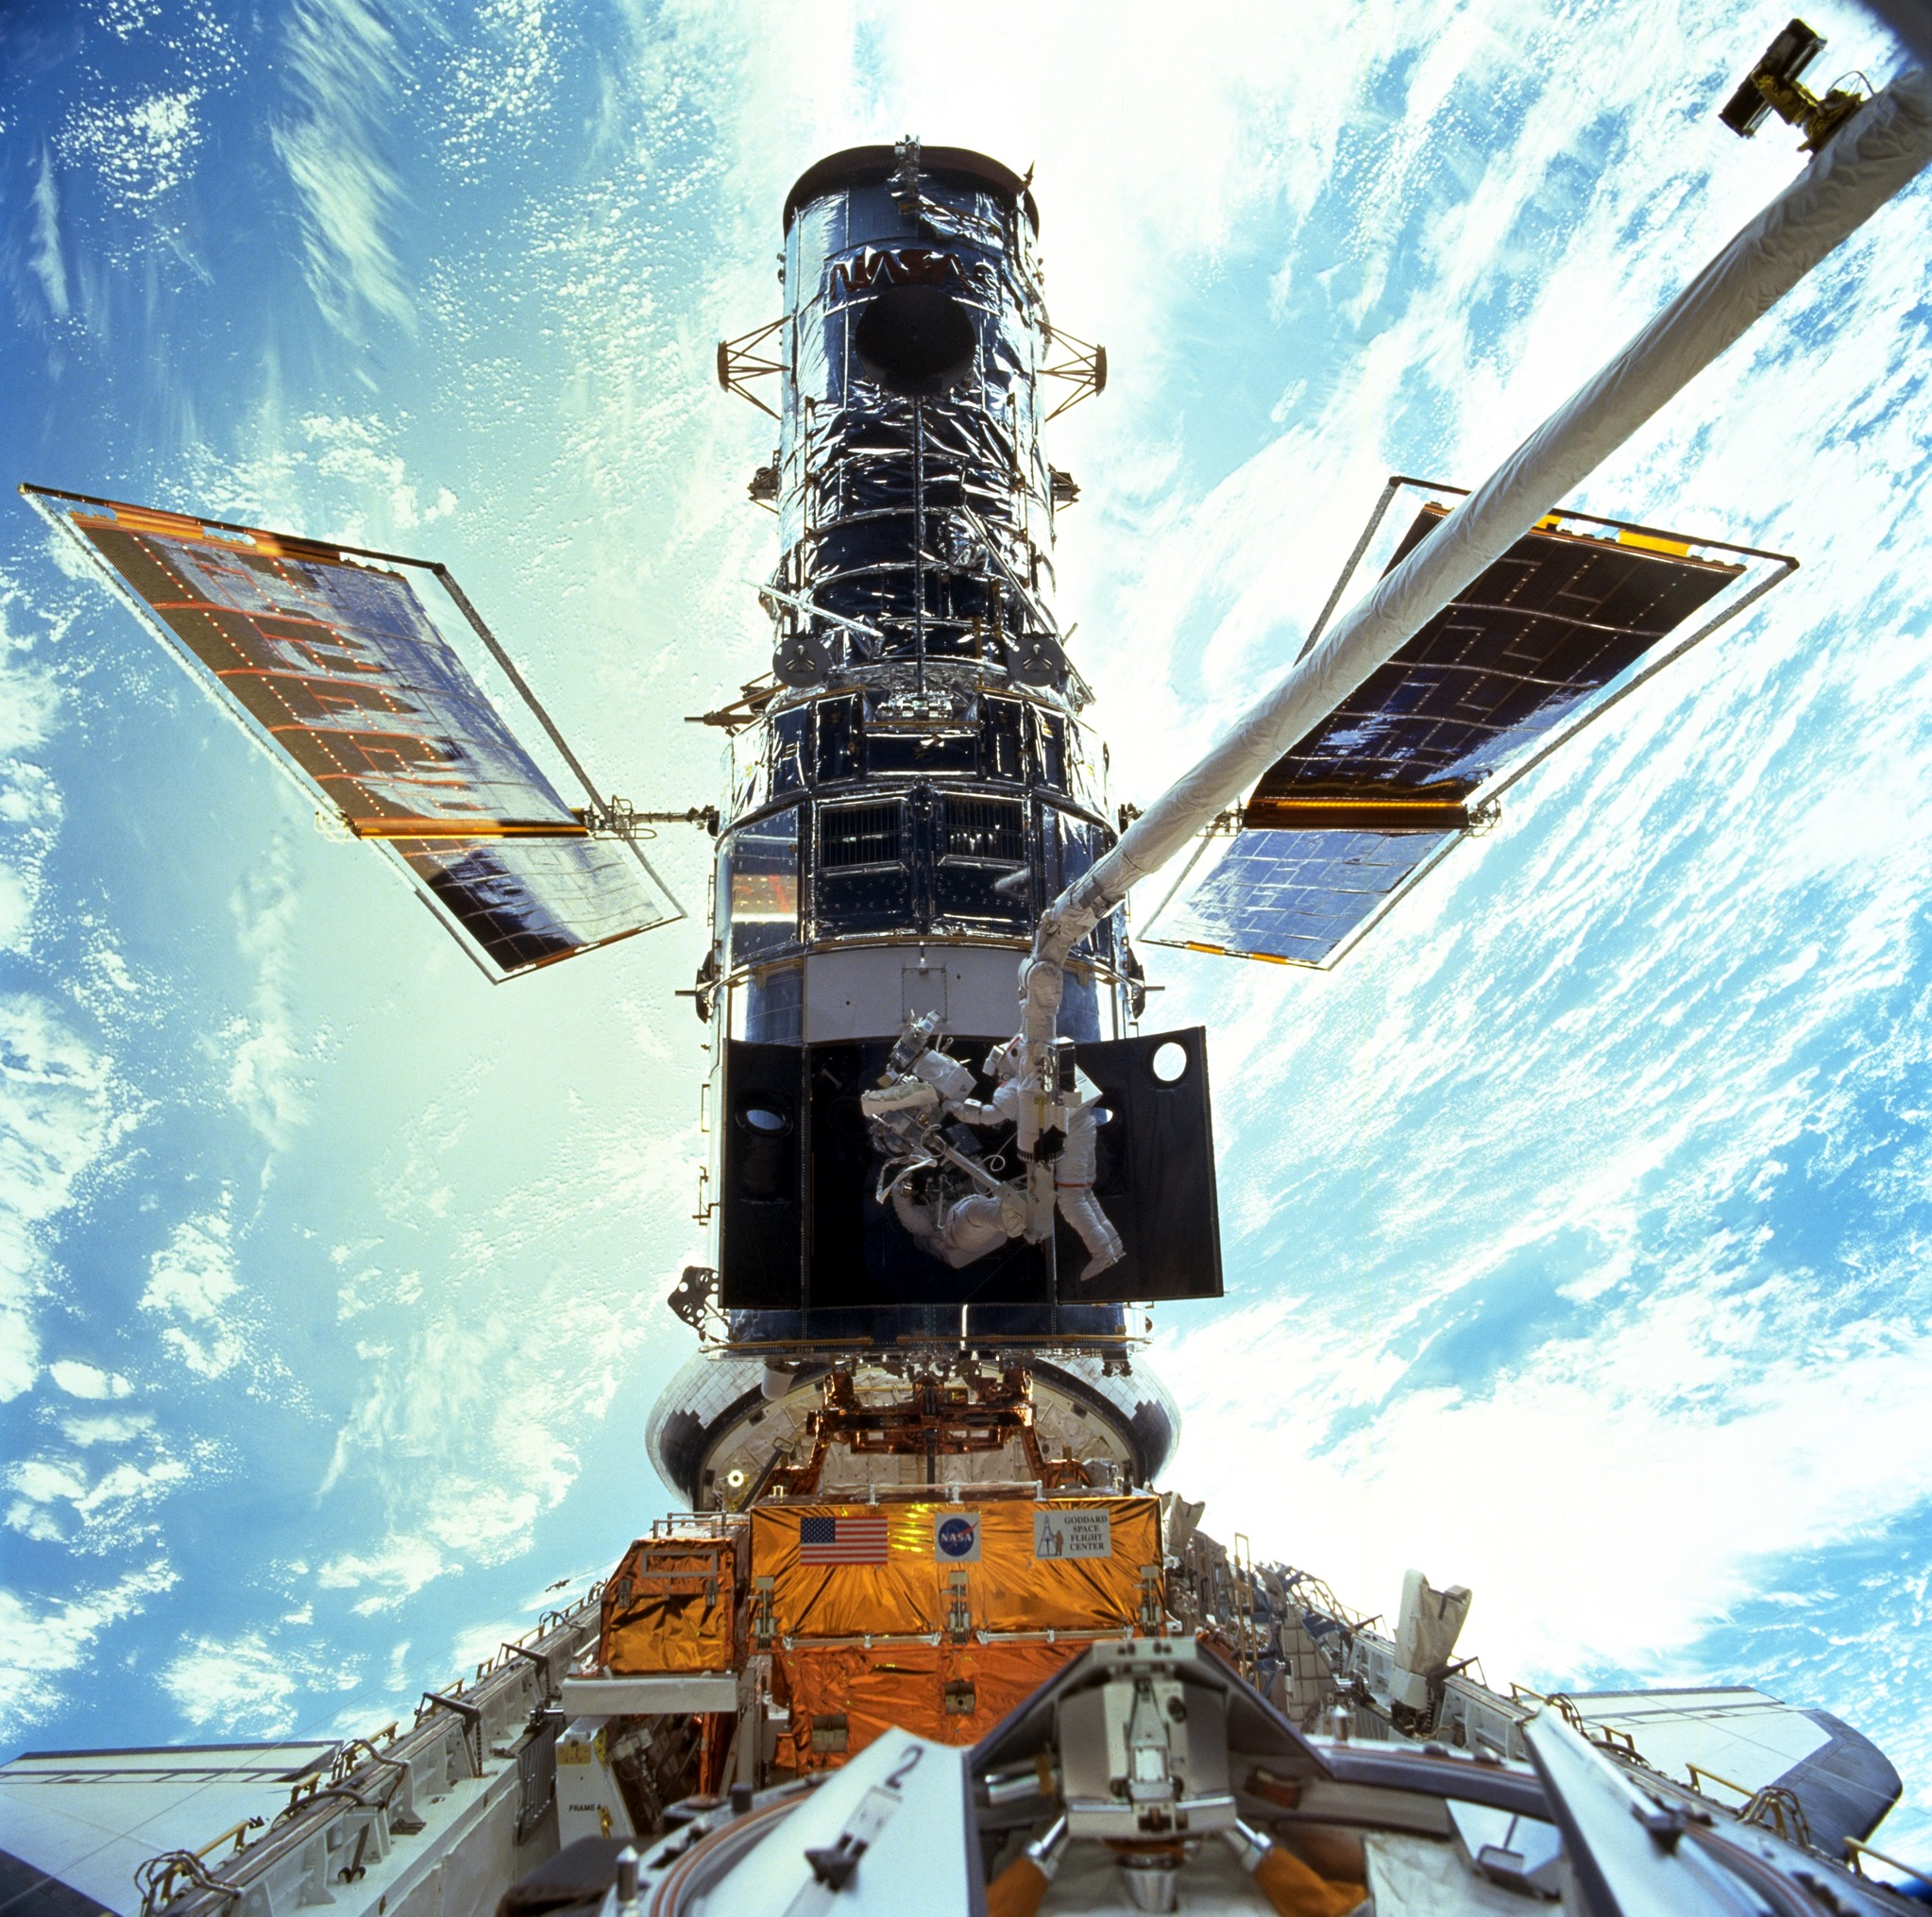 space shuttle hubble telescope - photo #16